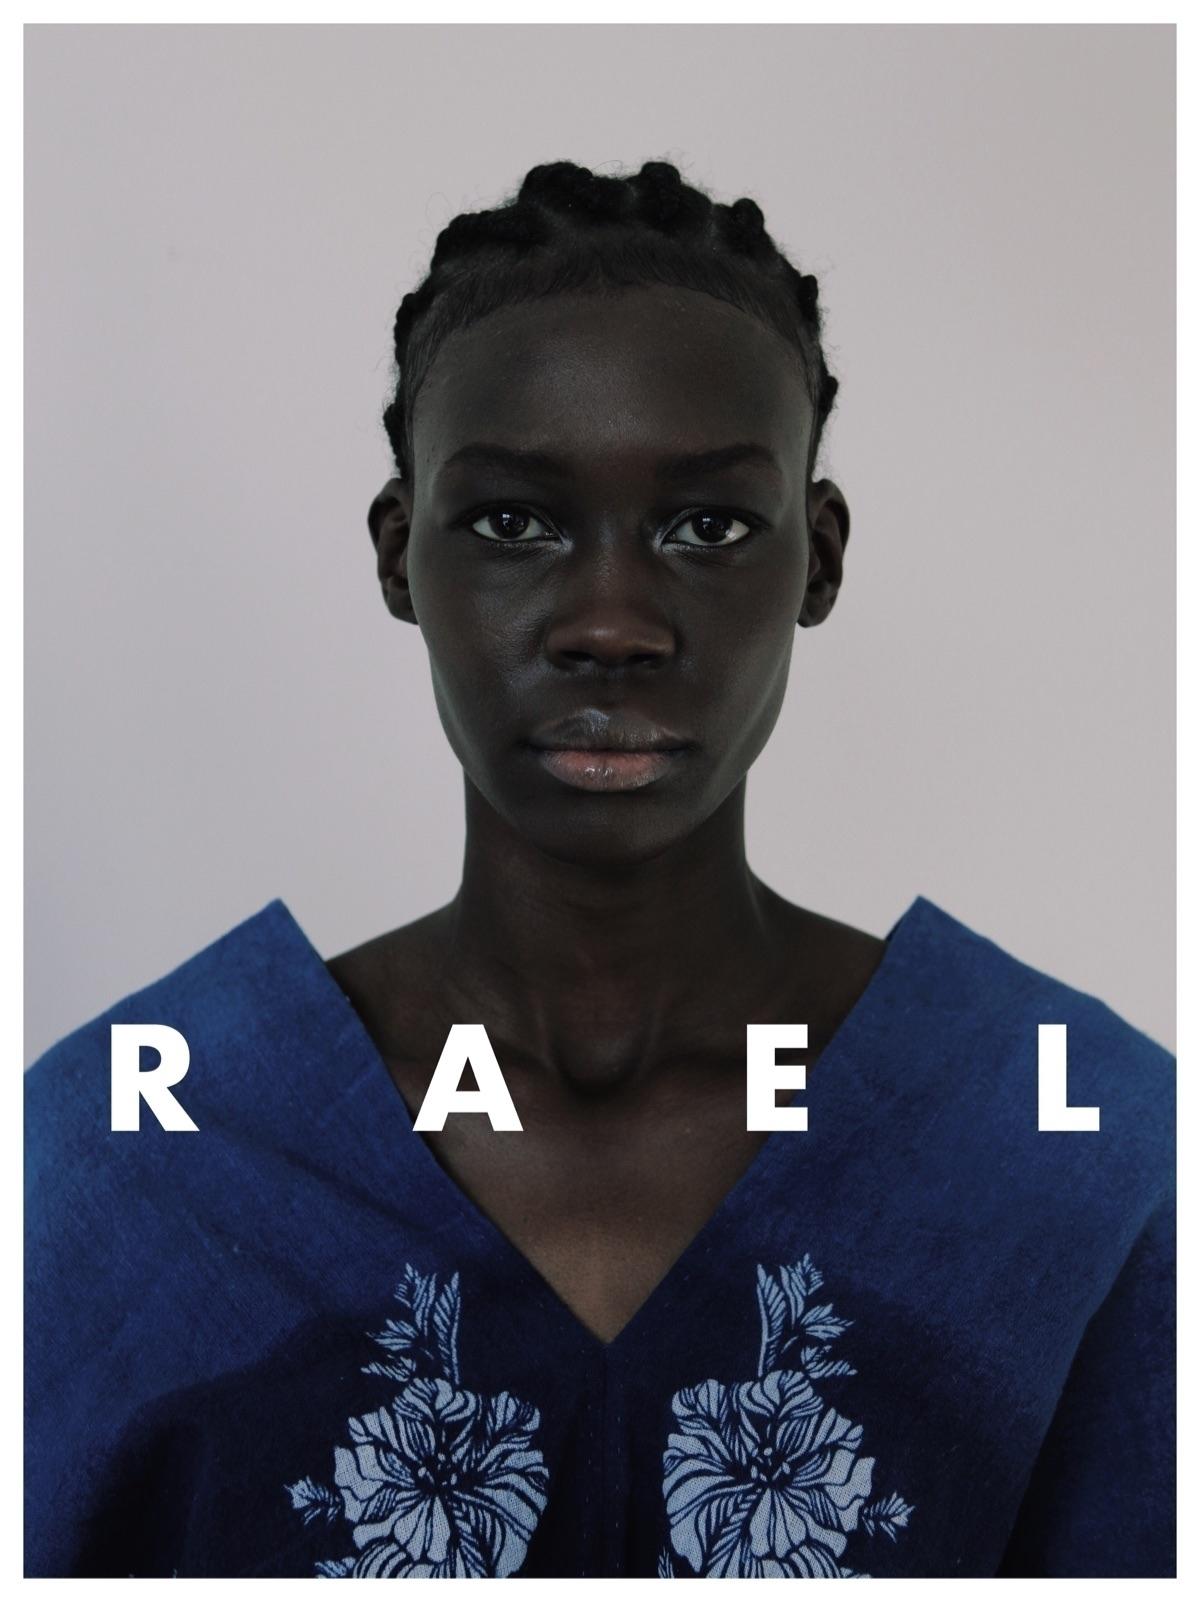 RAEL SS17 // Photo Jared Bautis - jaredbautista | ello